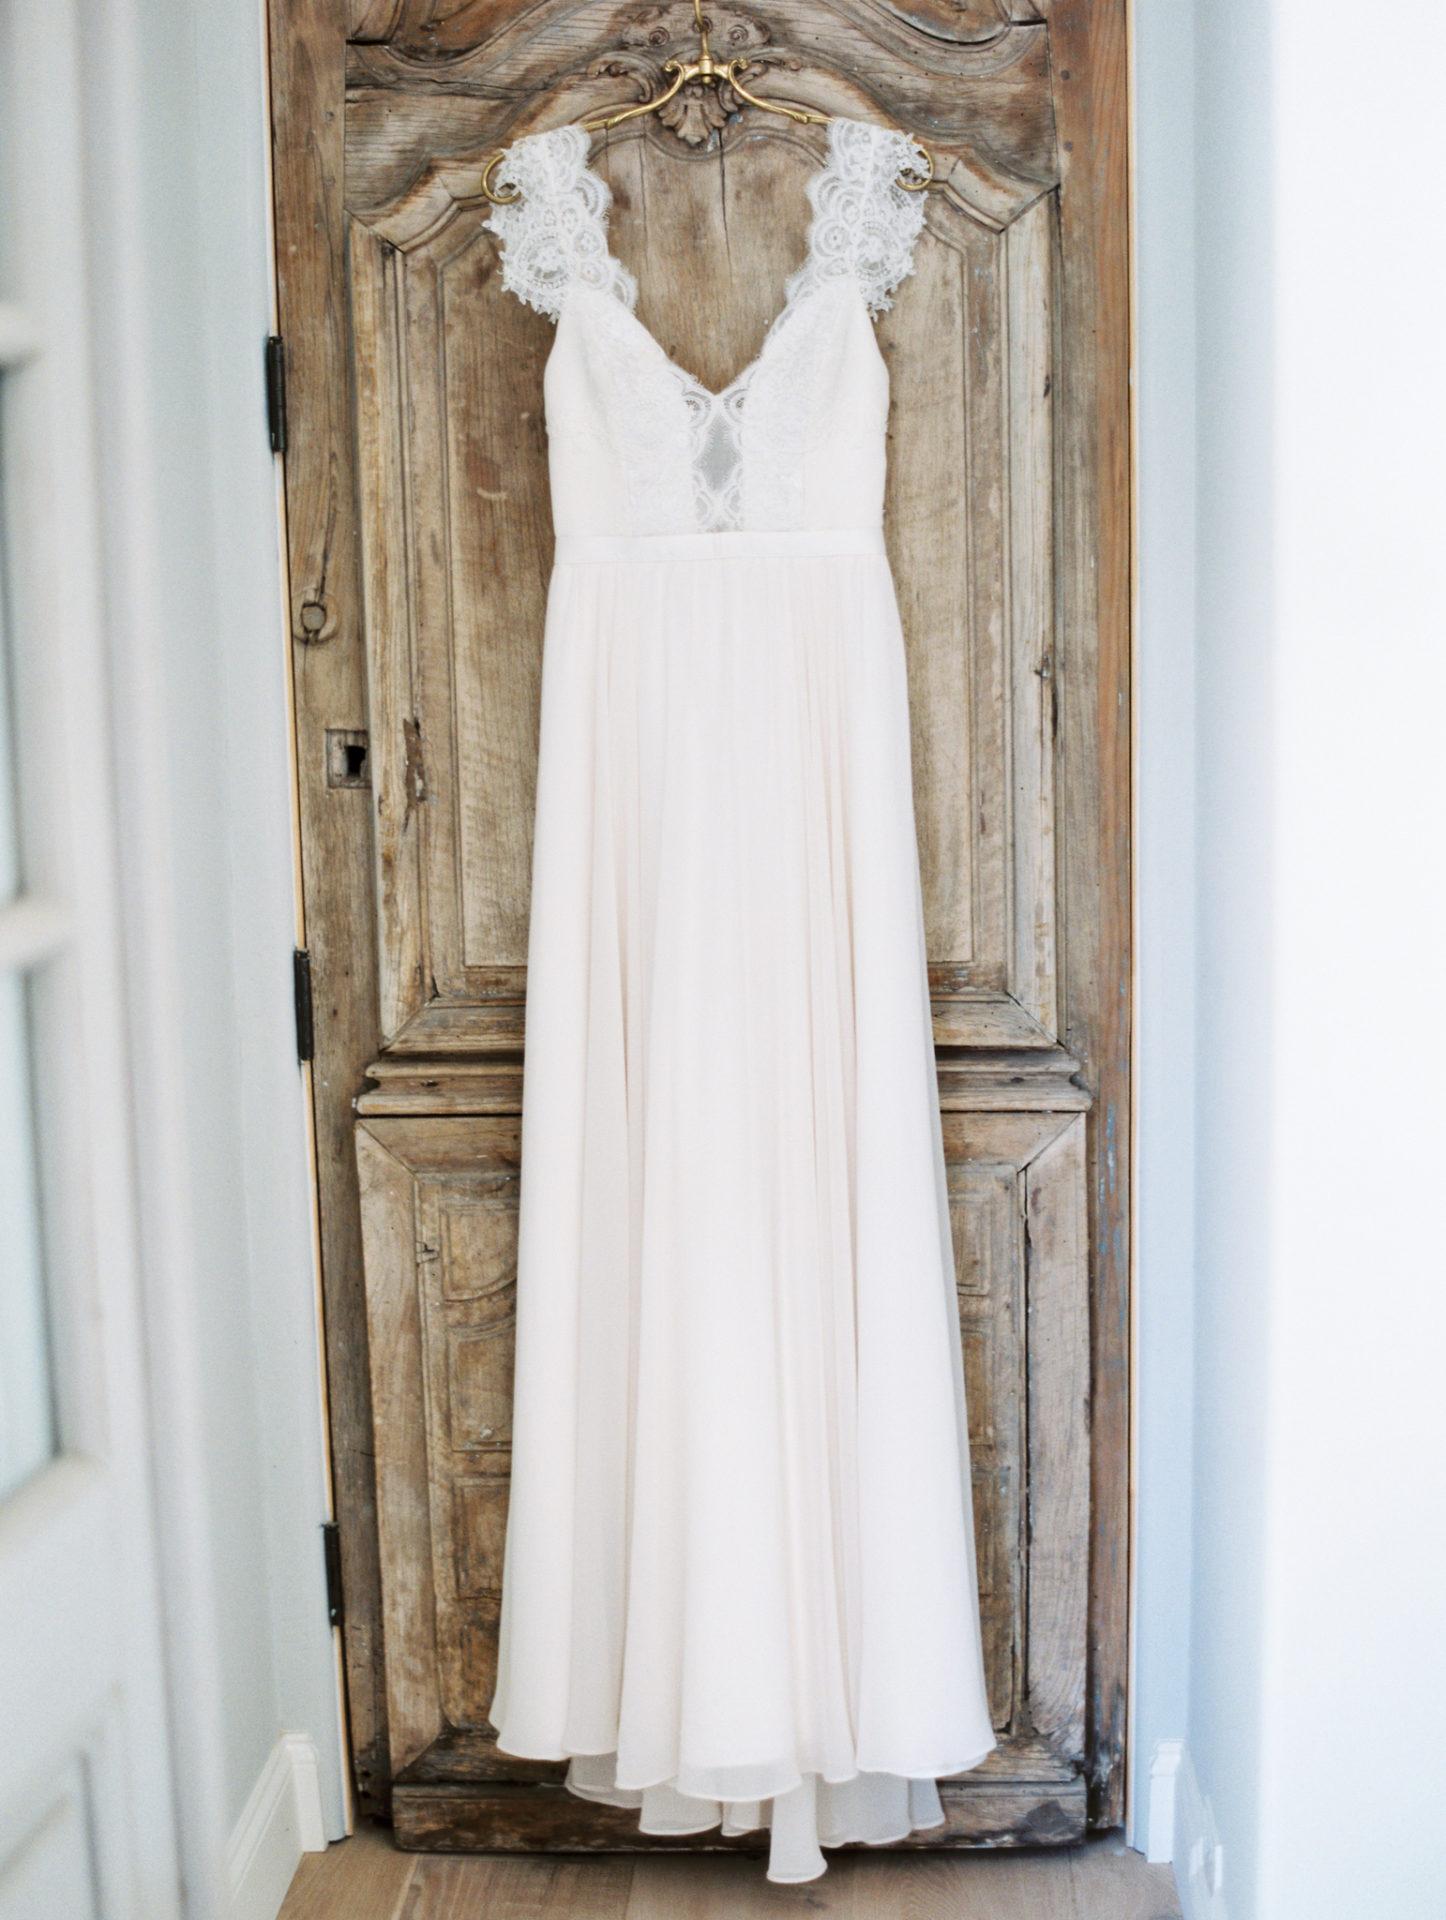 Timeless Spring Wedding Design With A Modern Twist Bride Portrait